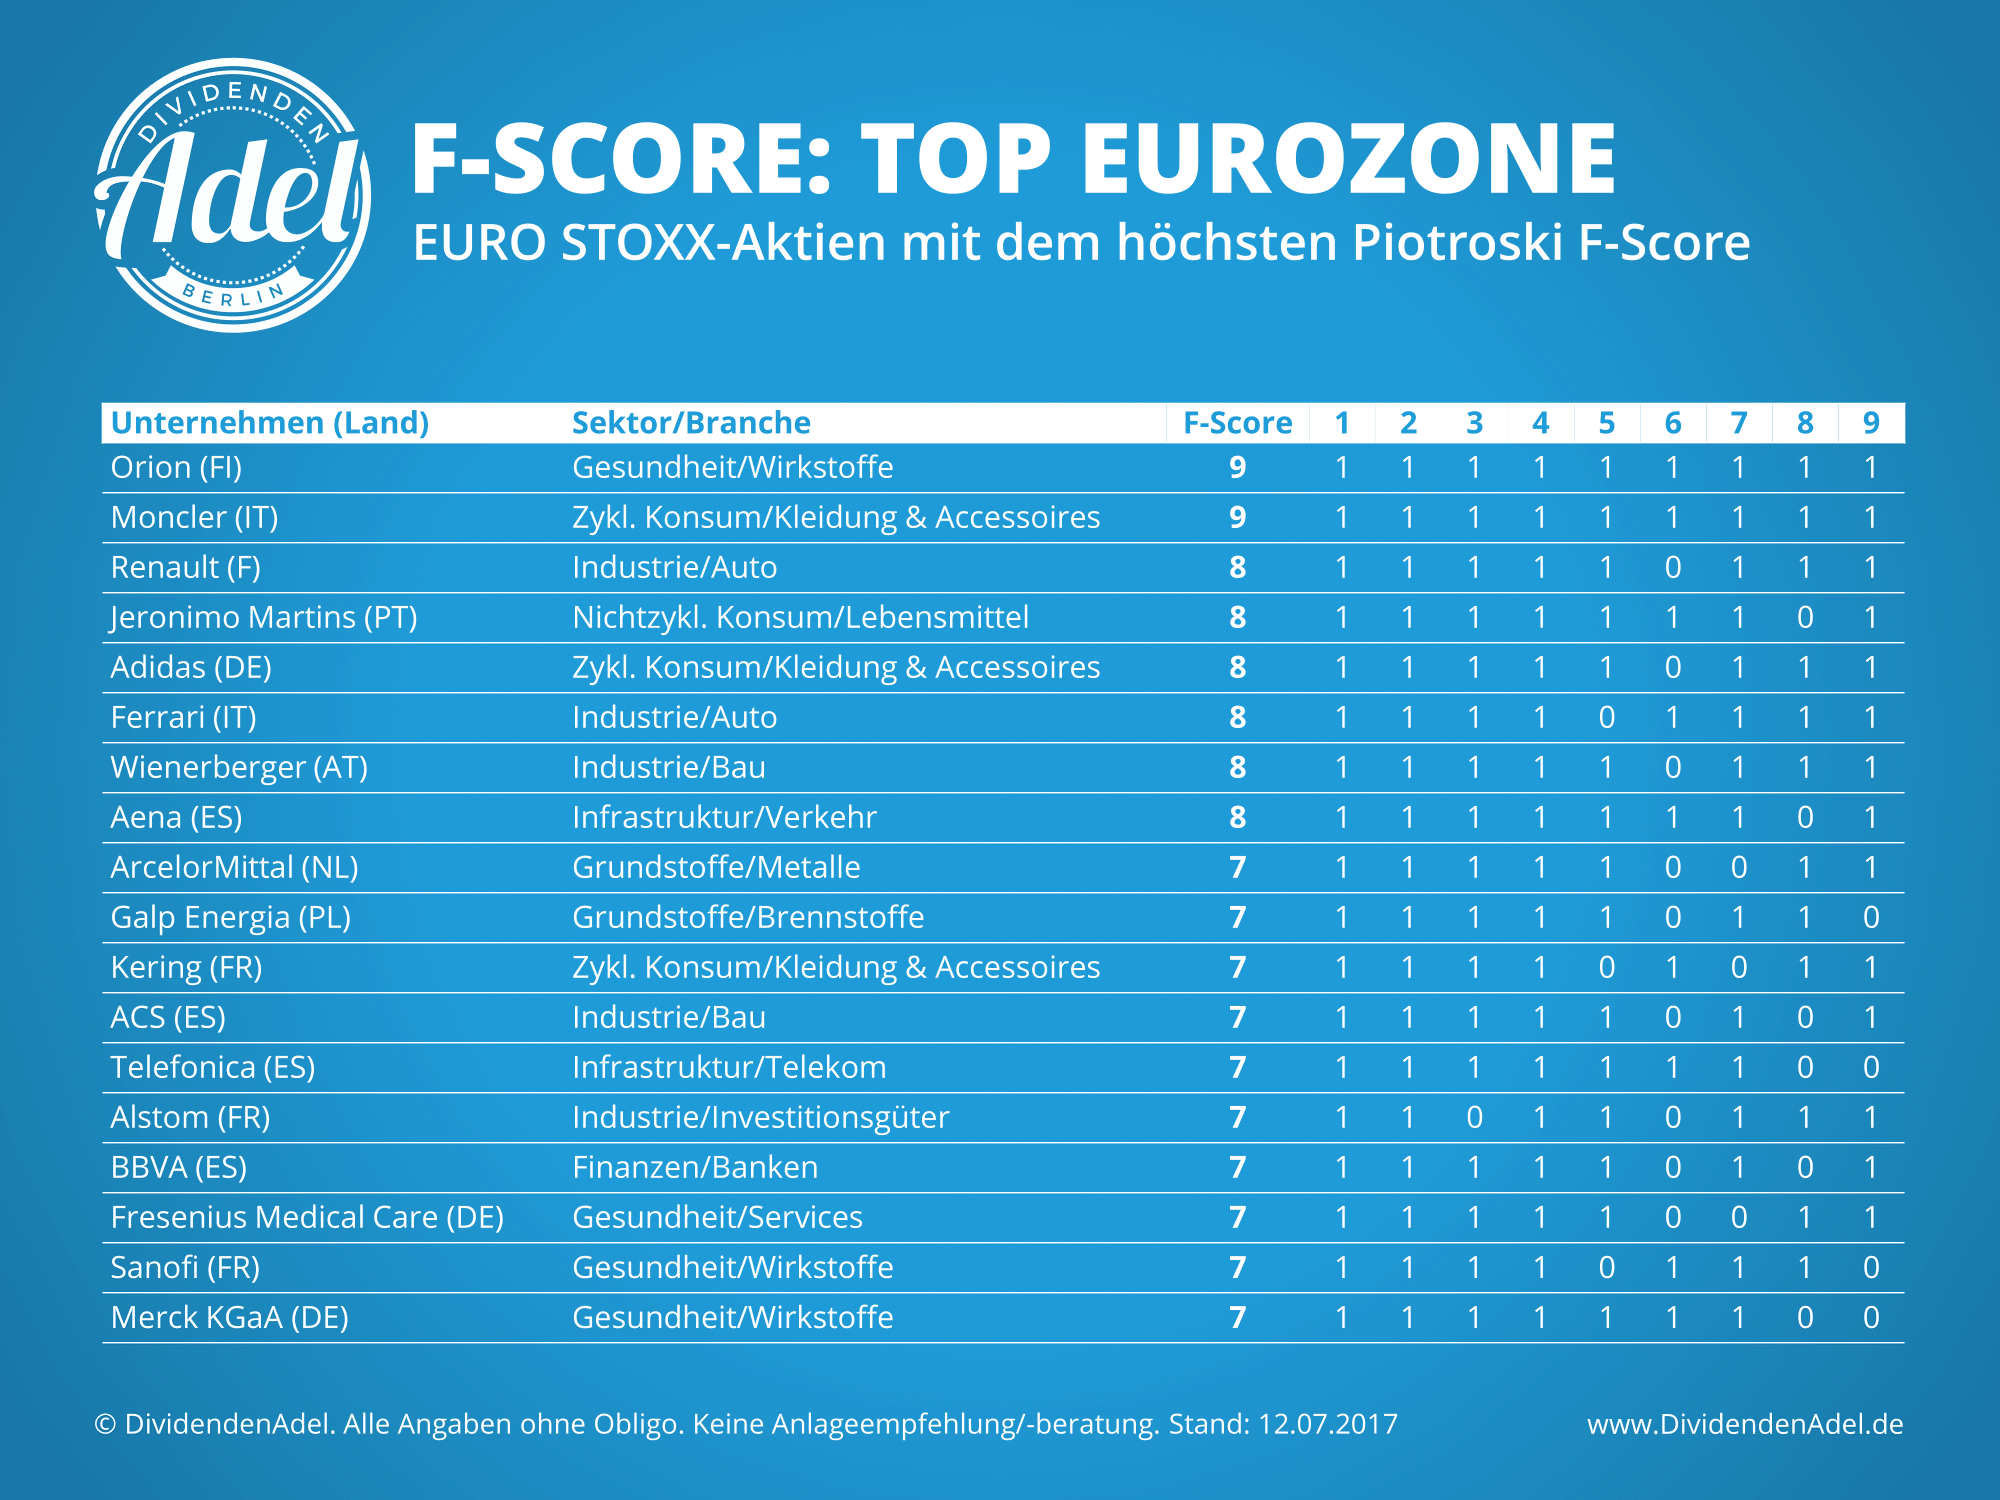 Piotroski F-Score Europa